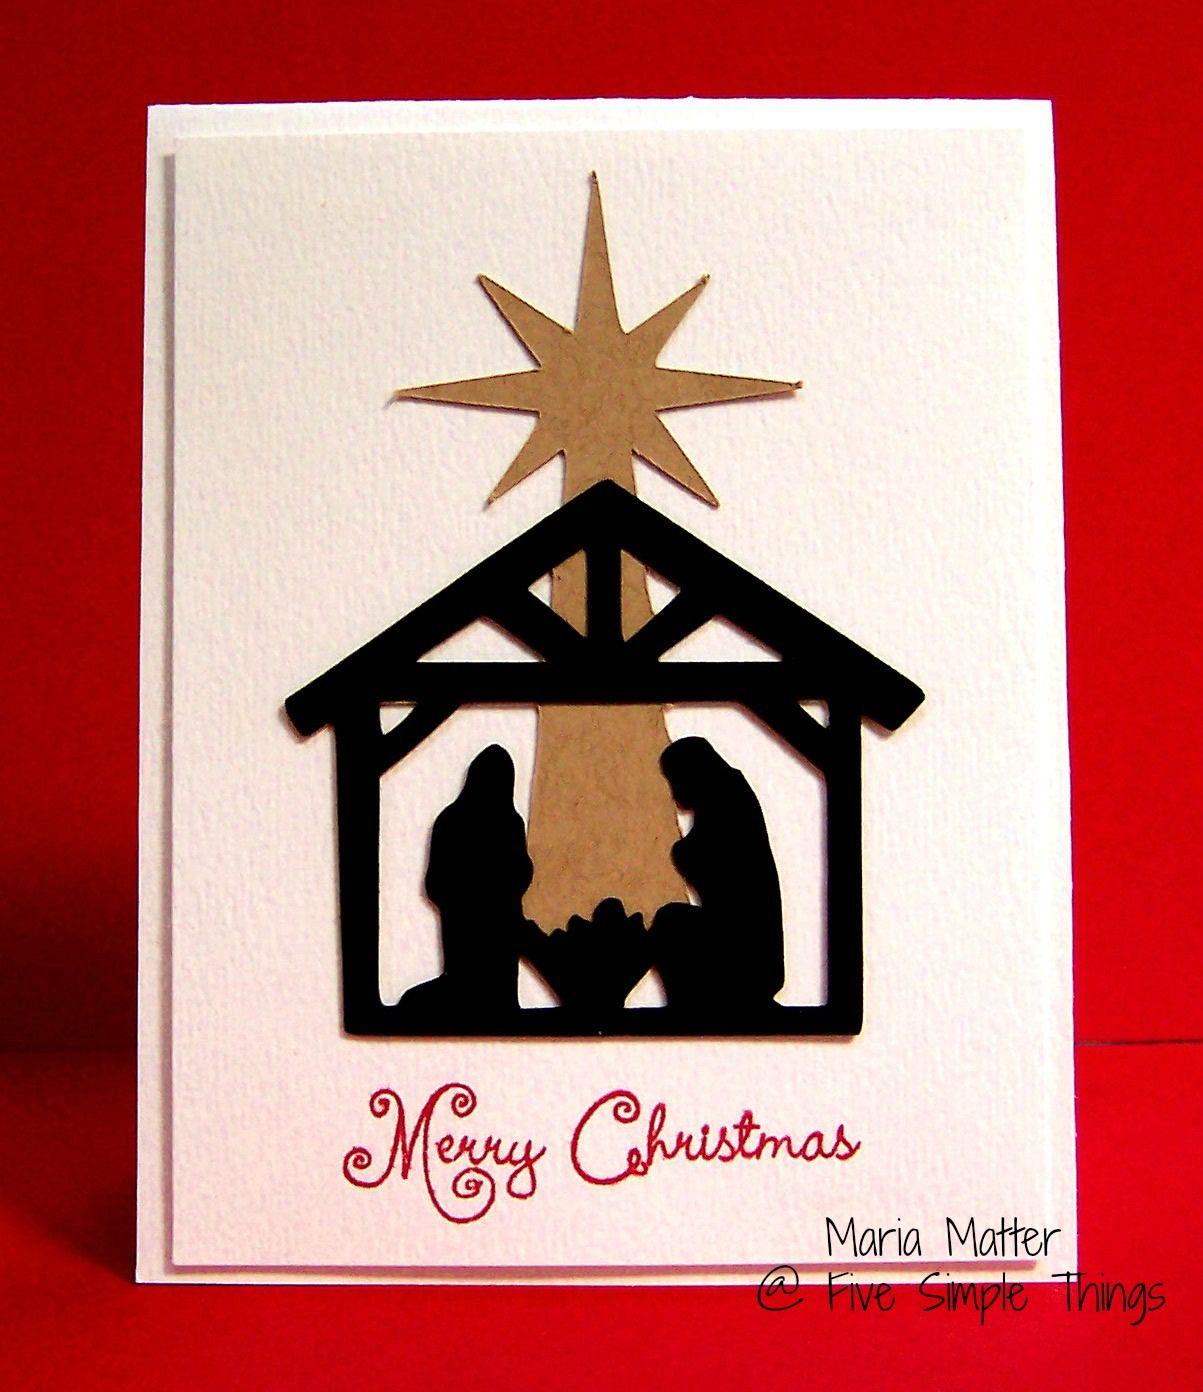 Christmas cards - cricut dec 25th - Google Search | Dec. 25th ...